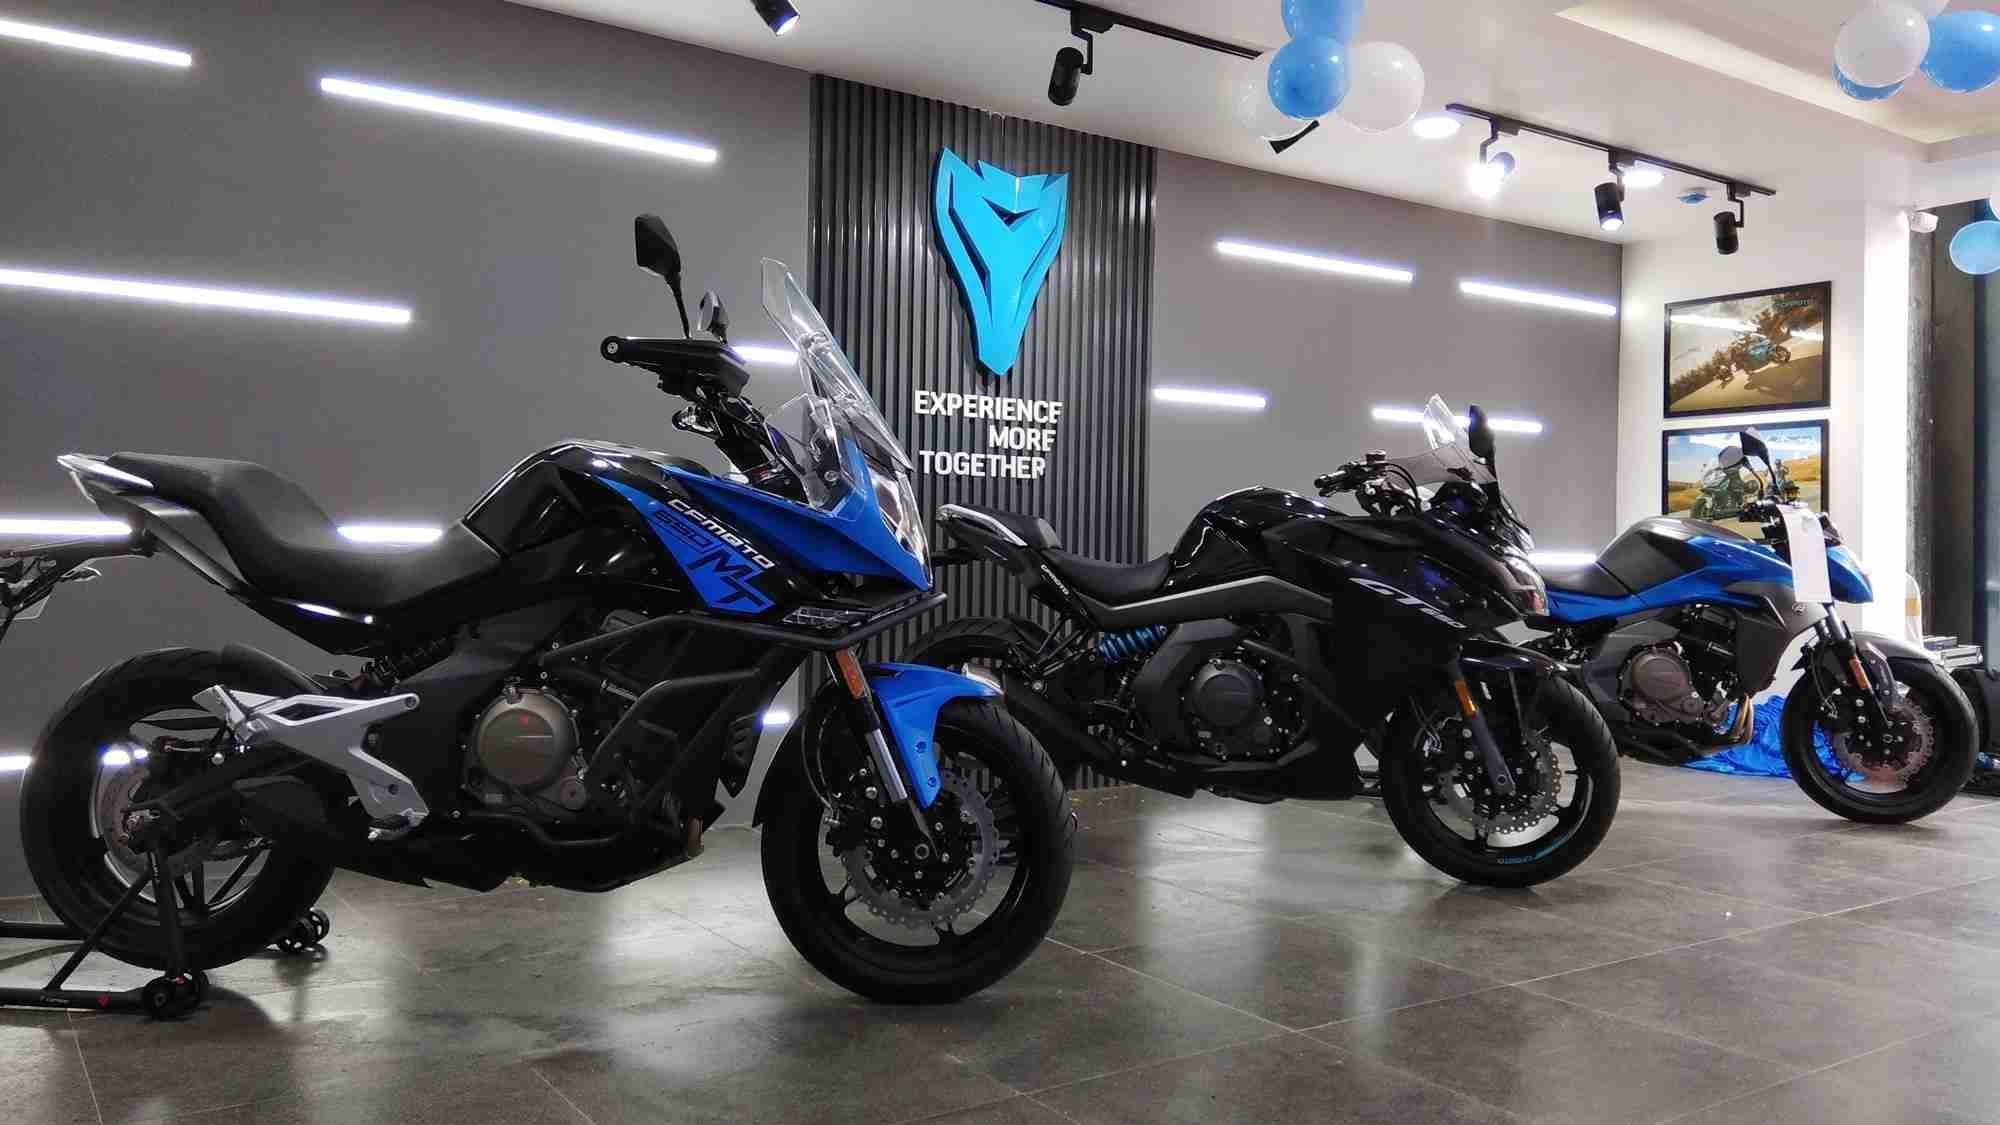 CF Moto Bengaluru dealership